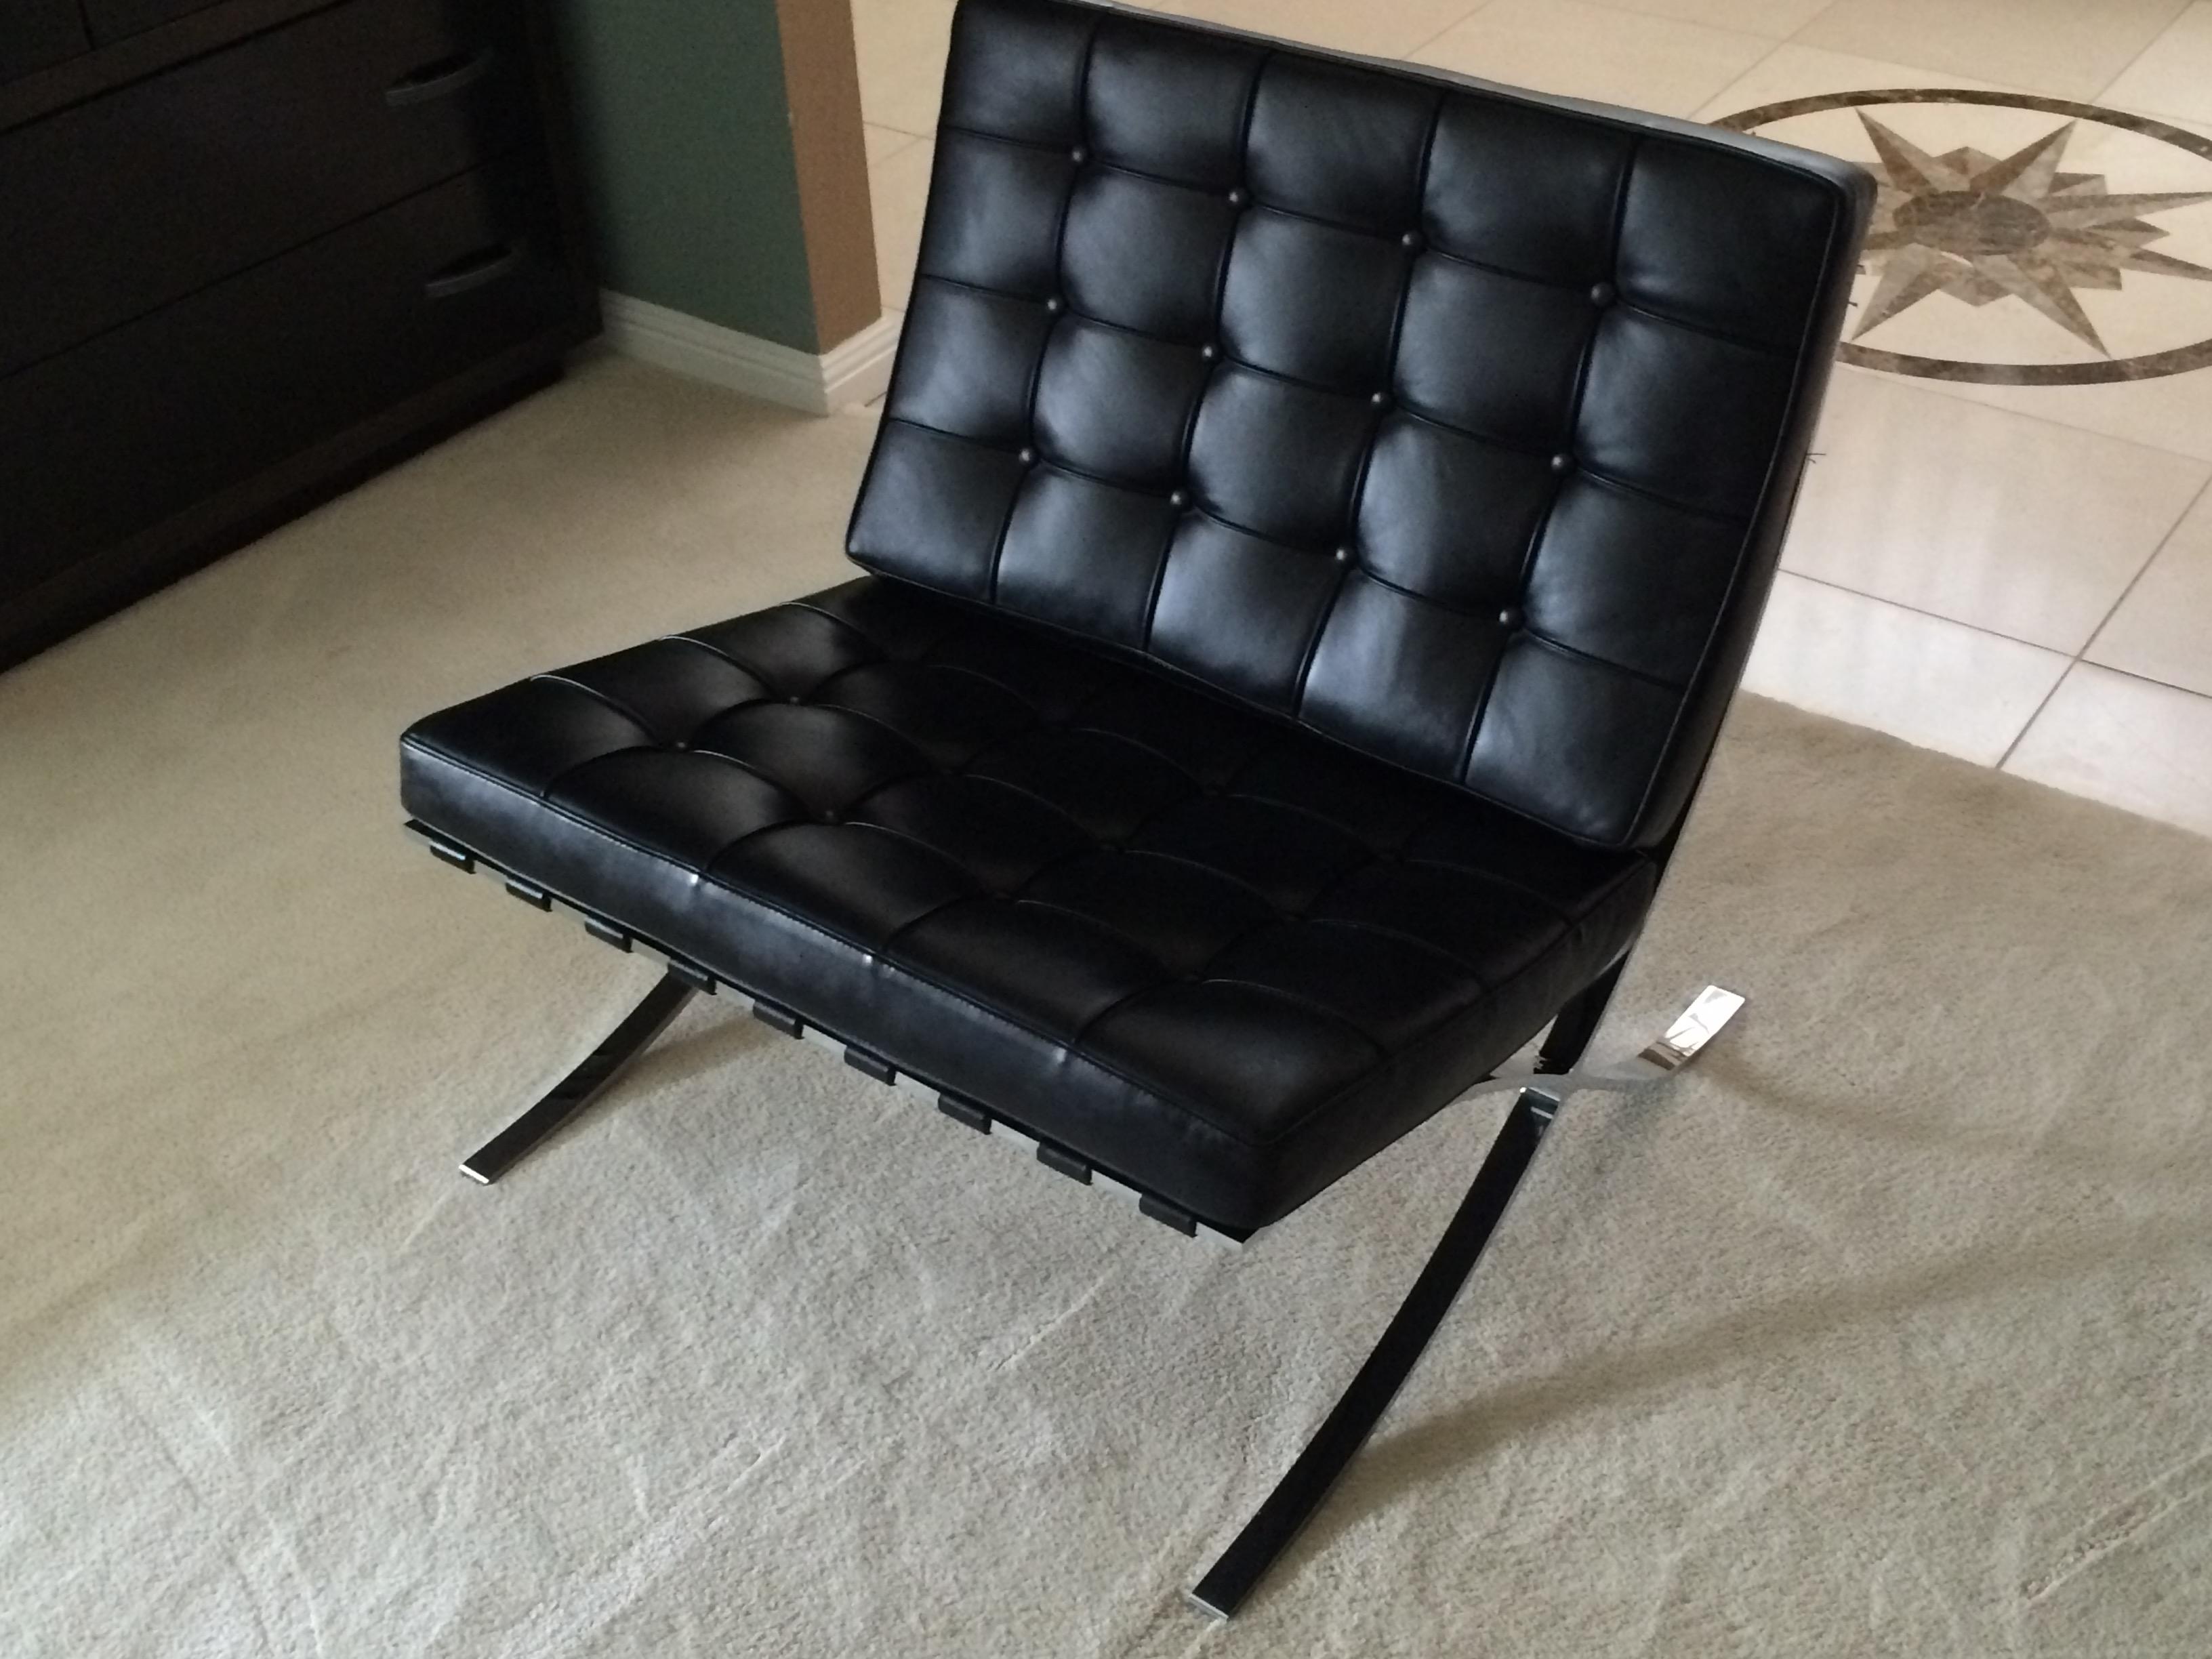 Charmant Leather Barcelona Chair U0026 Ottoman By Alivar   Image 6 ...